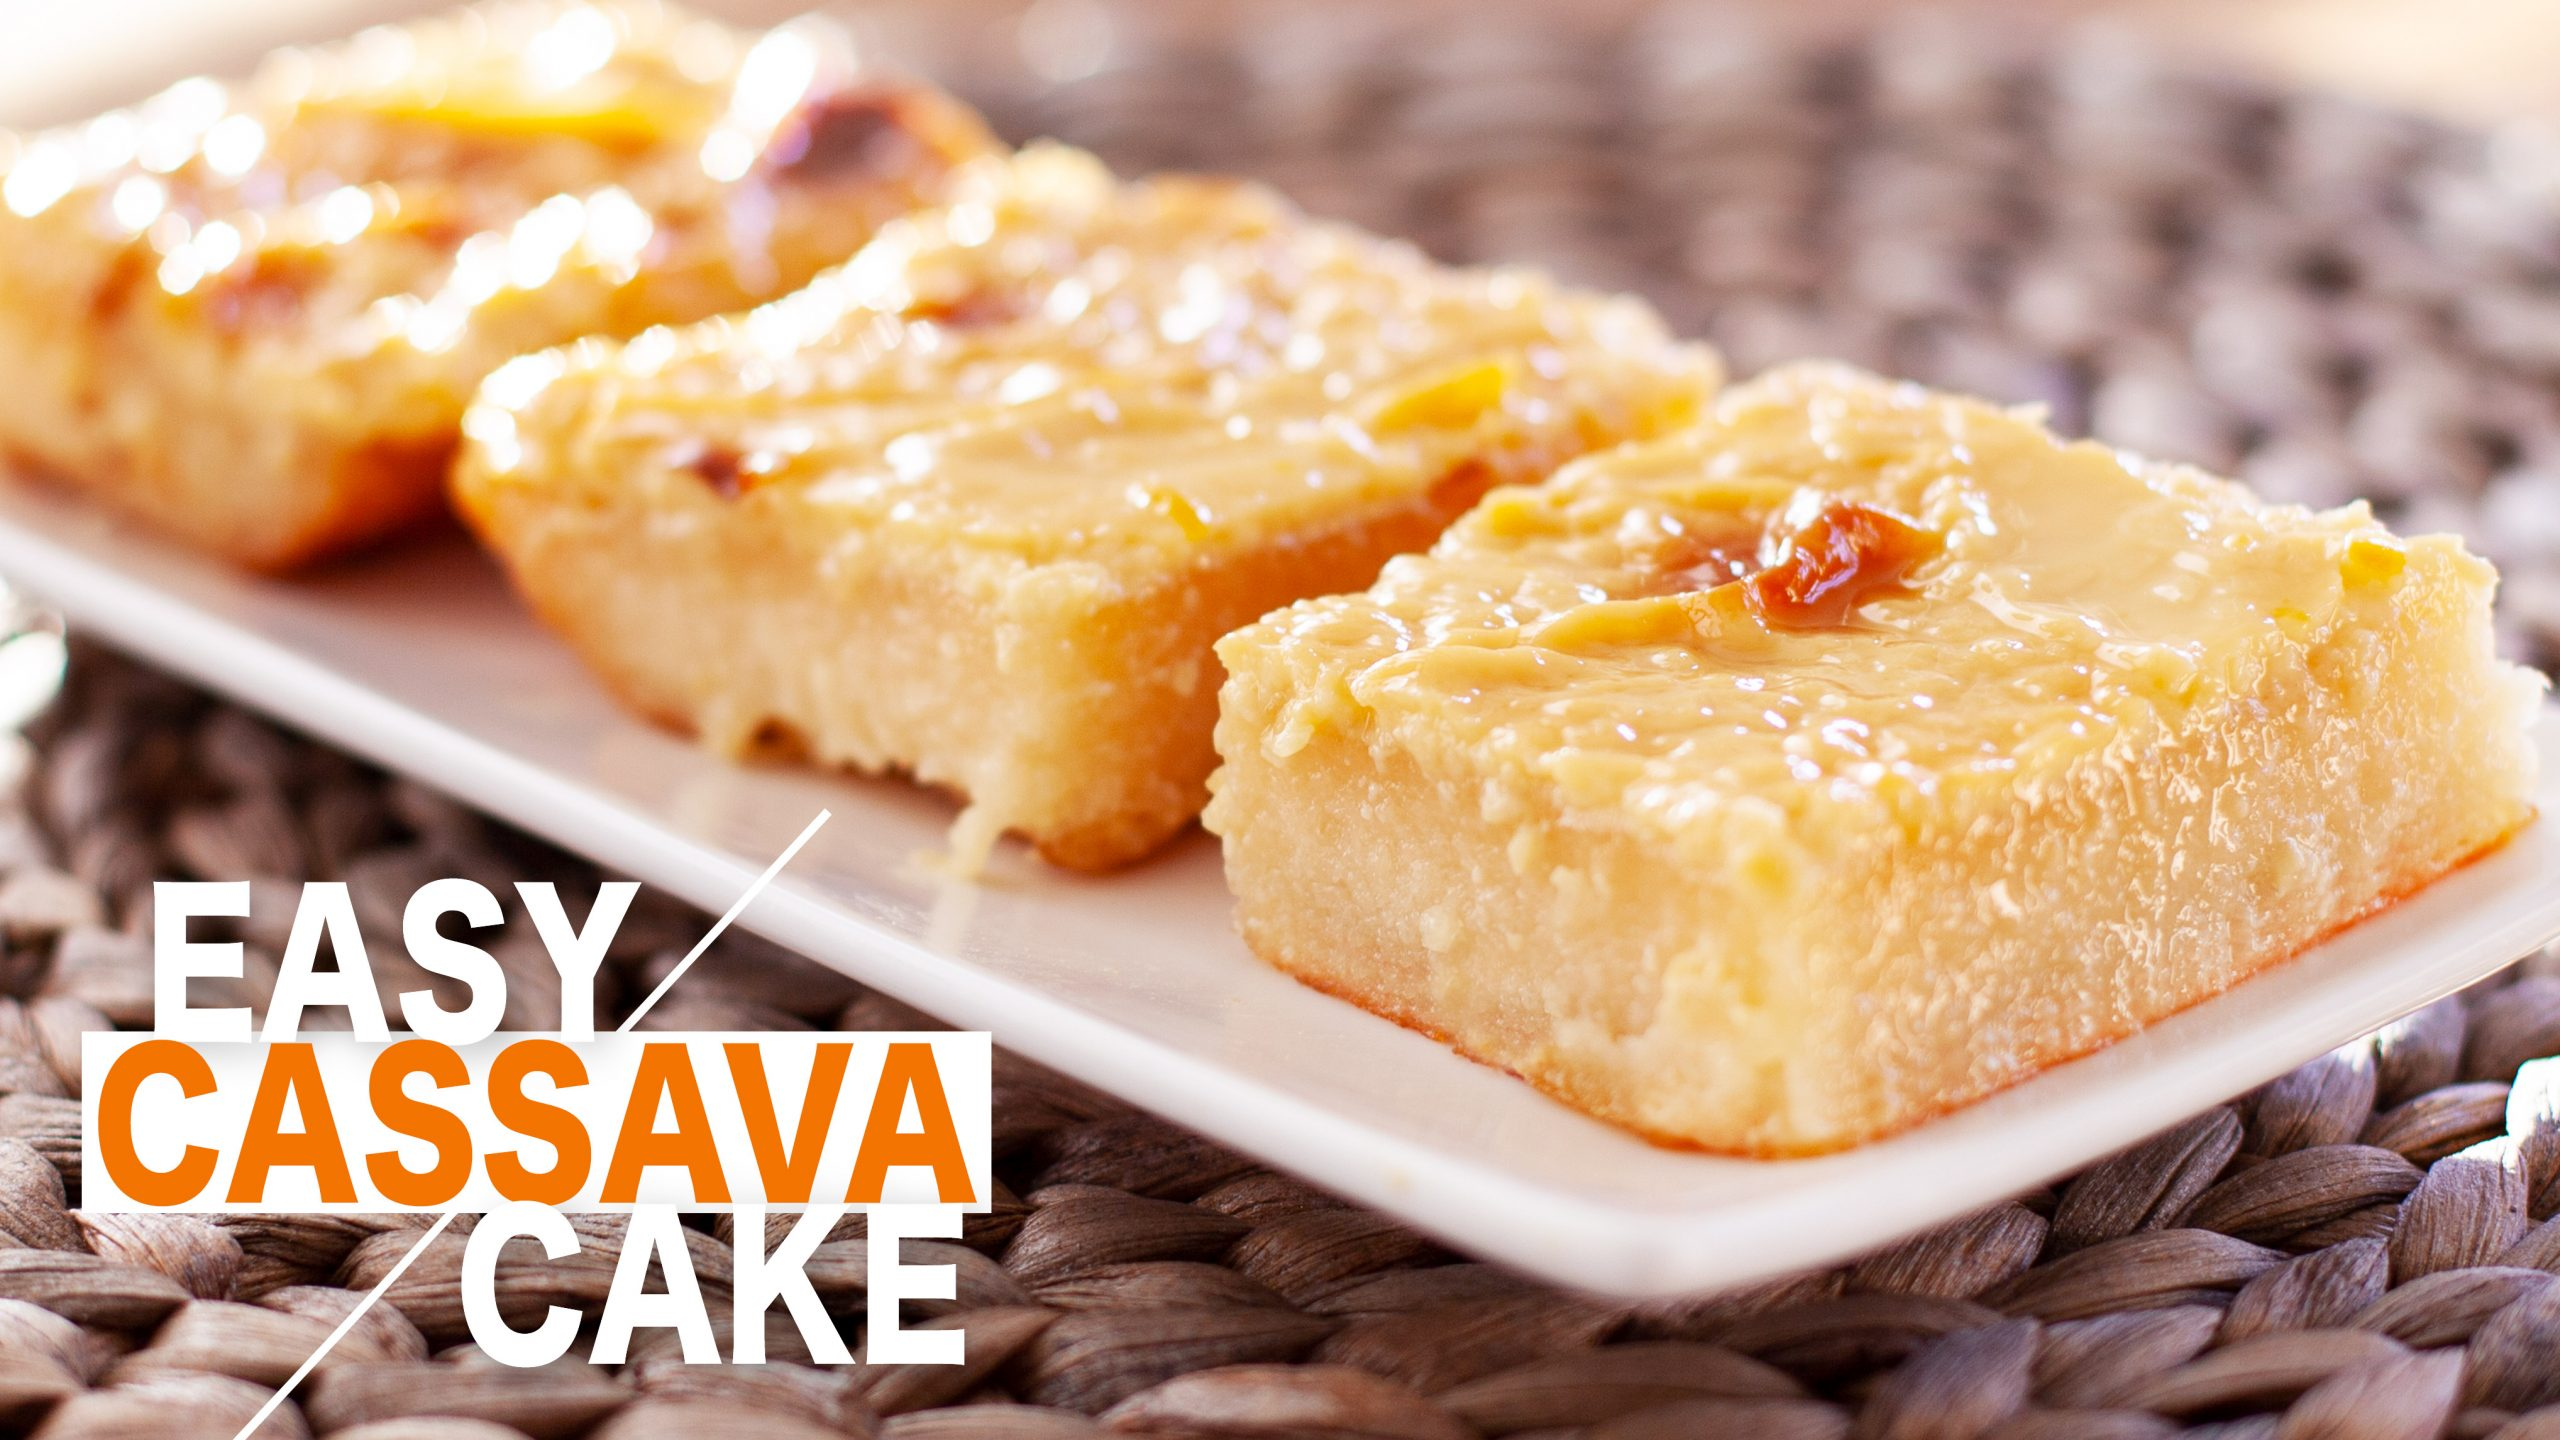 Texas Pinoy Kitchen Cassava Cake